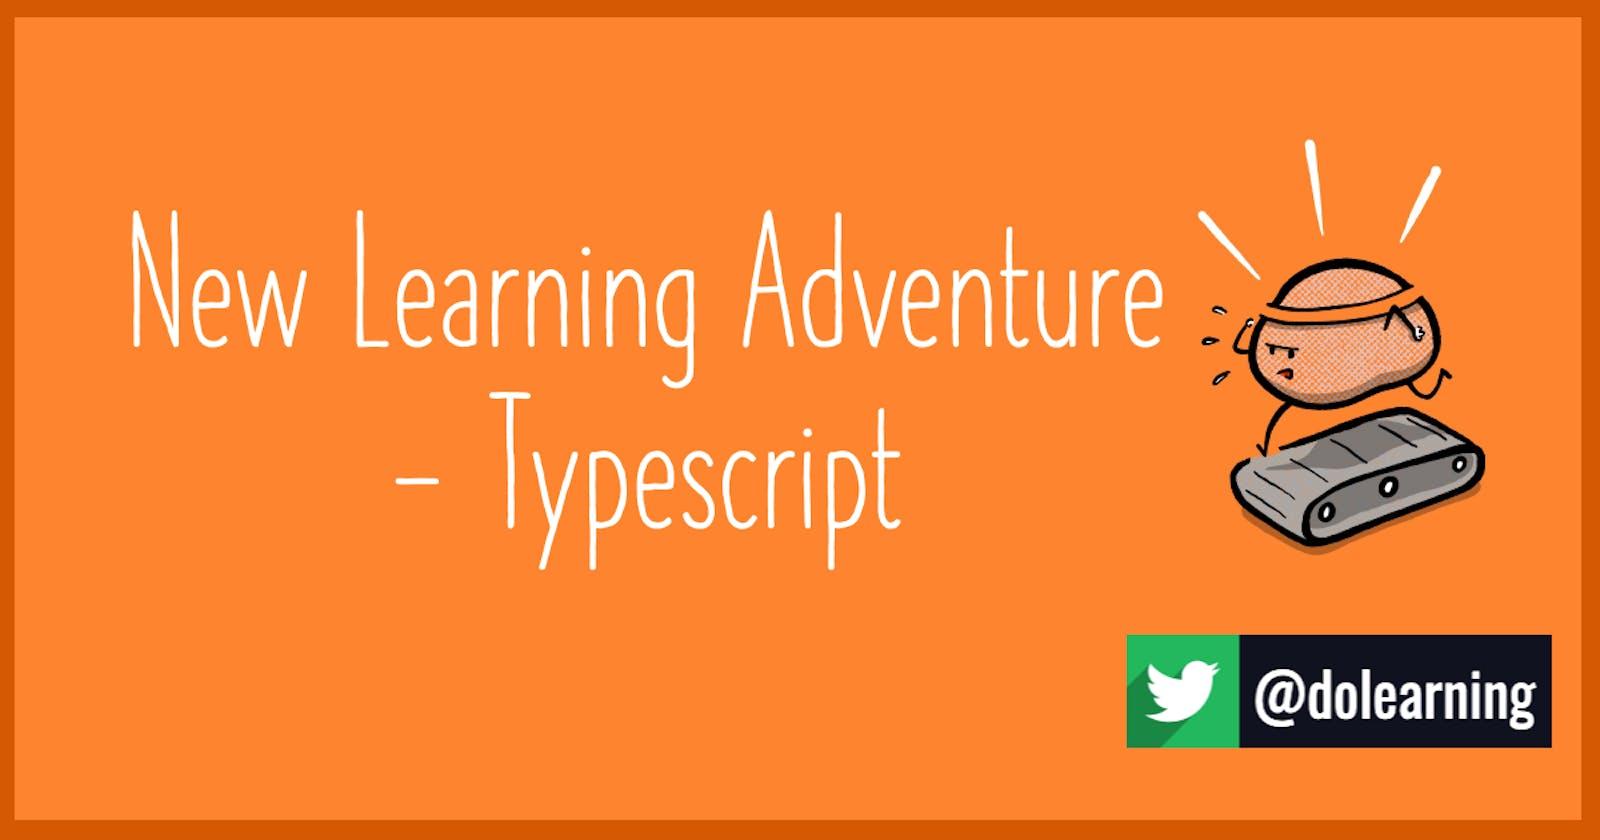 New Learning Adventure - Typescript